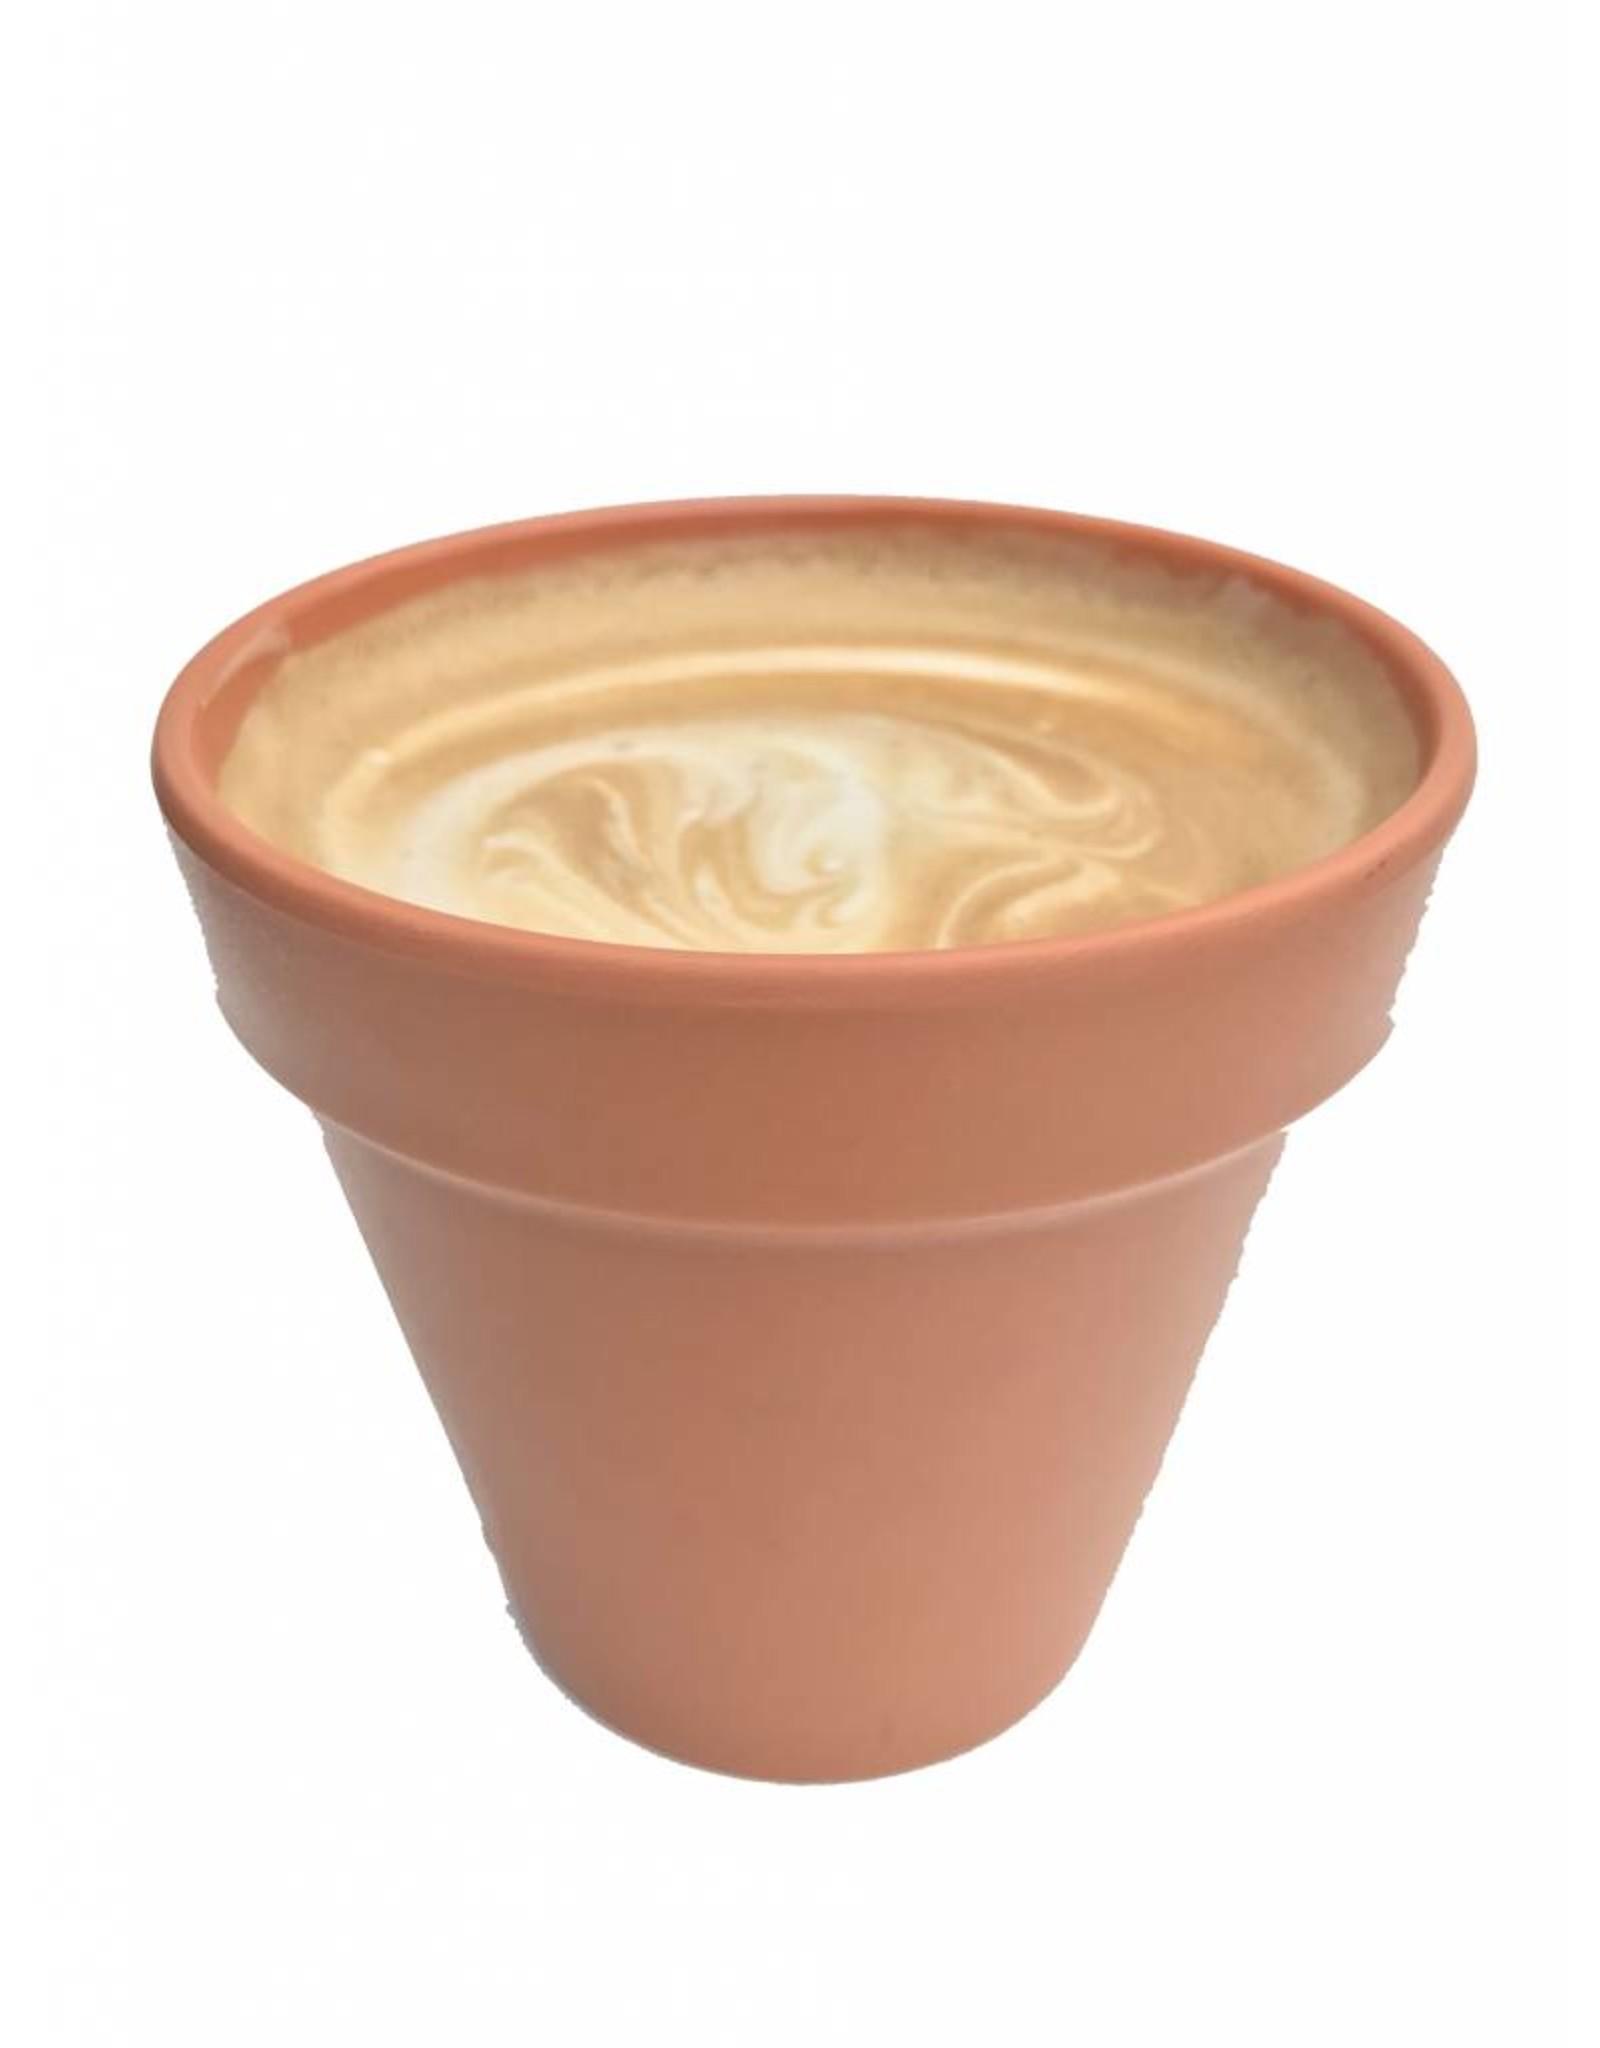 Terra Cotta Cup Set - 4 Qty